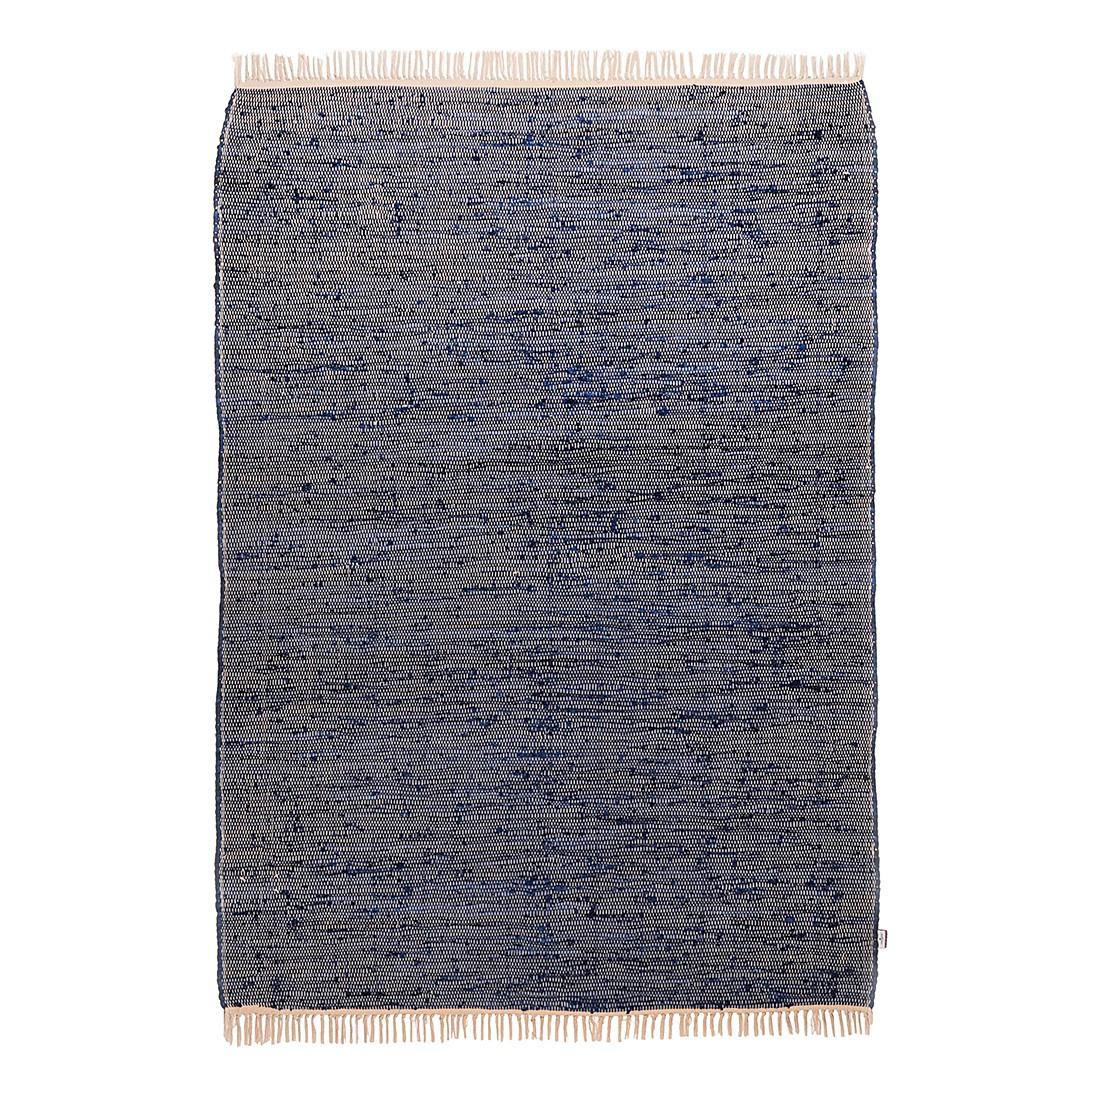 Vloerkleed Cotton - Jeansblauw - 60x120cm, Tom Tailor